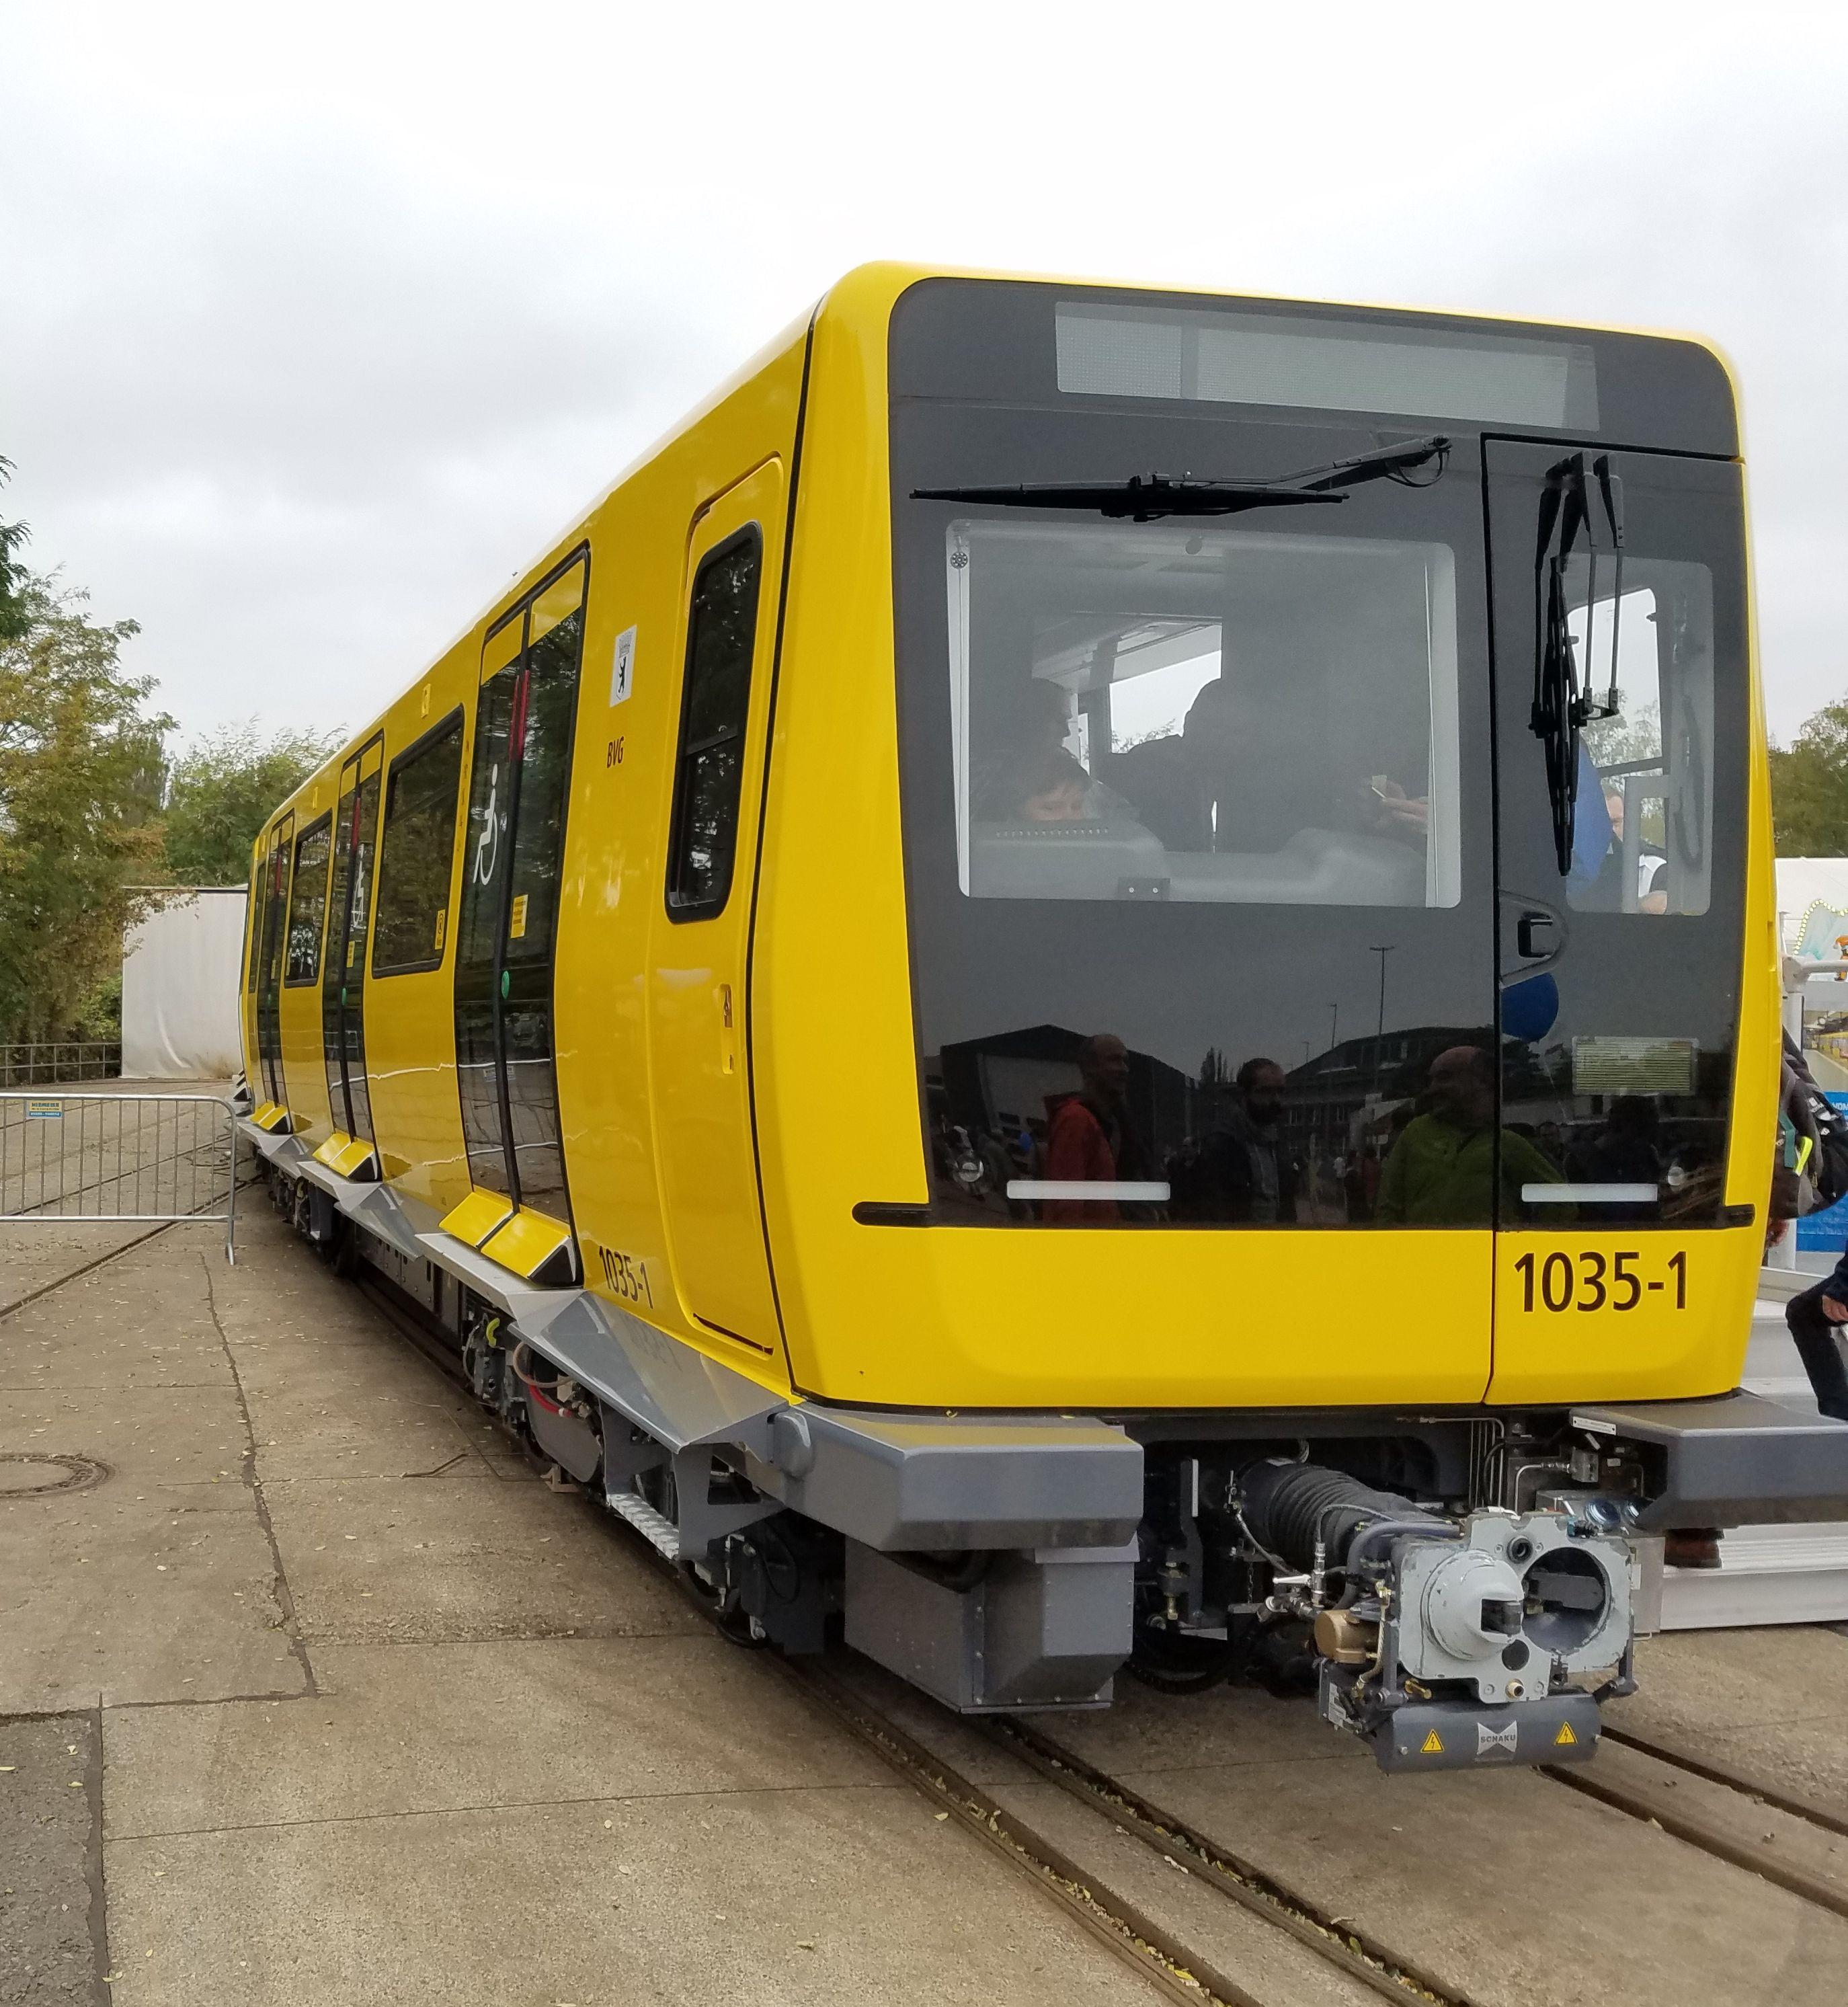 U-Bahn 1036